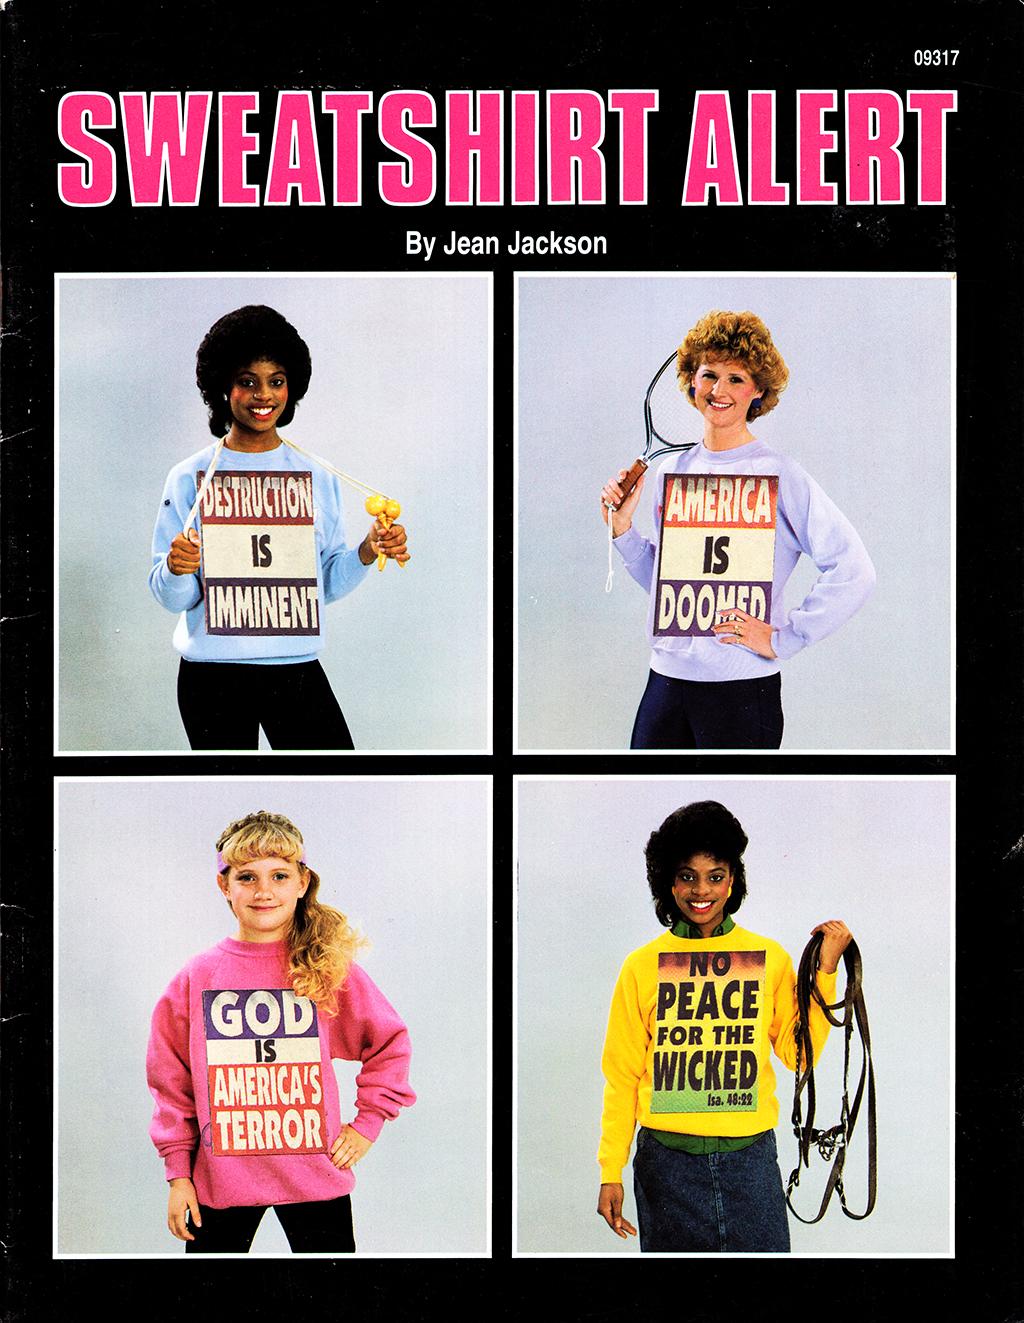 Sweatshirt Alert, 2013 Collage